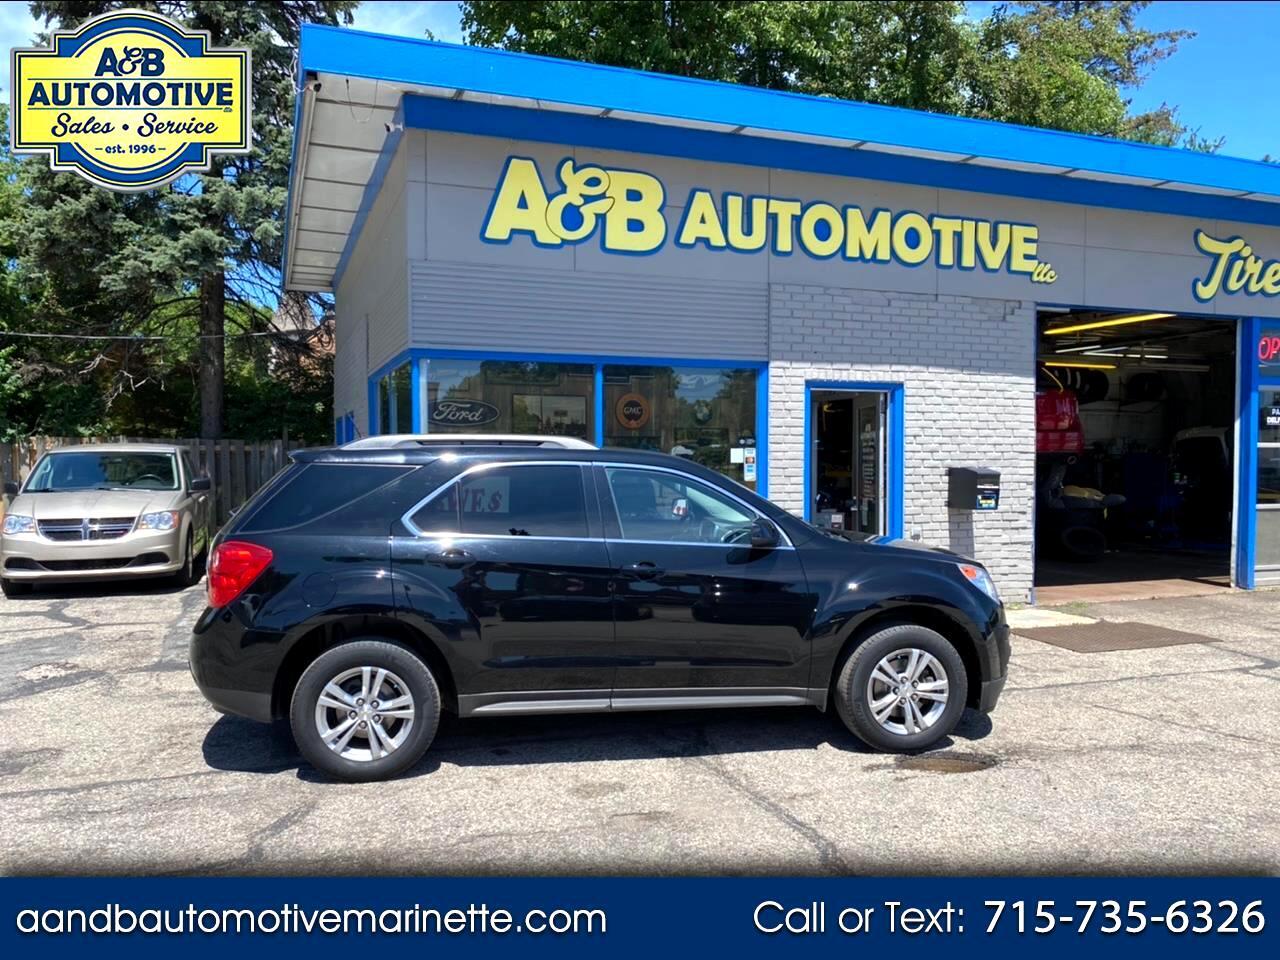 Chevrolet Equinox FWD 4dr LT w/1LT 2014